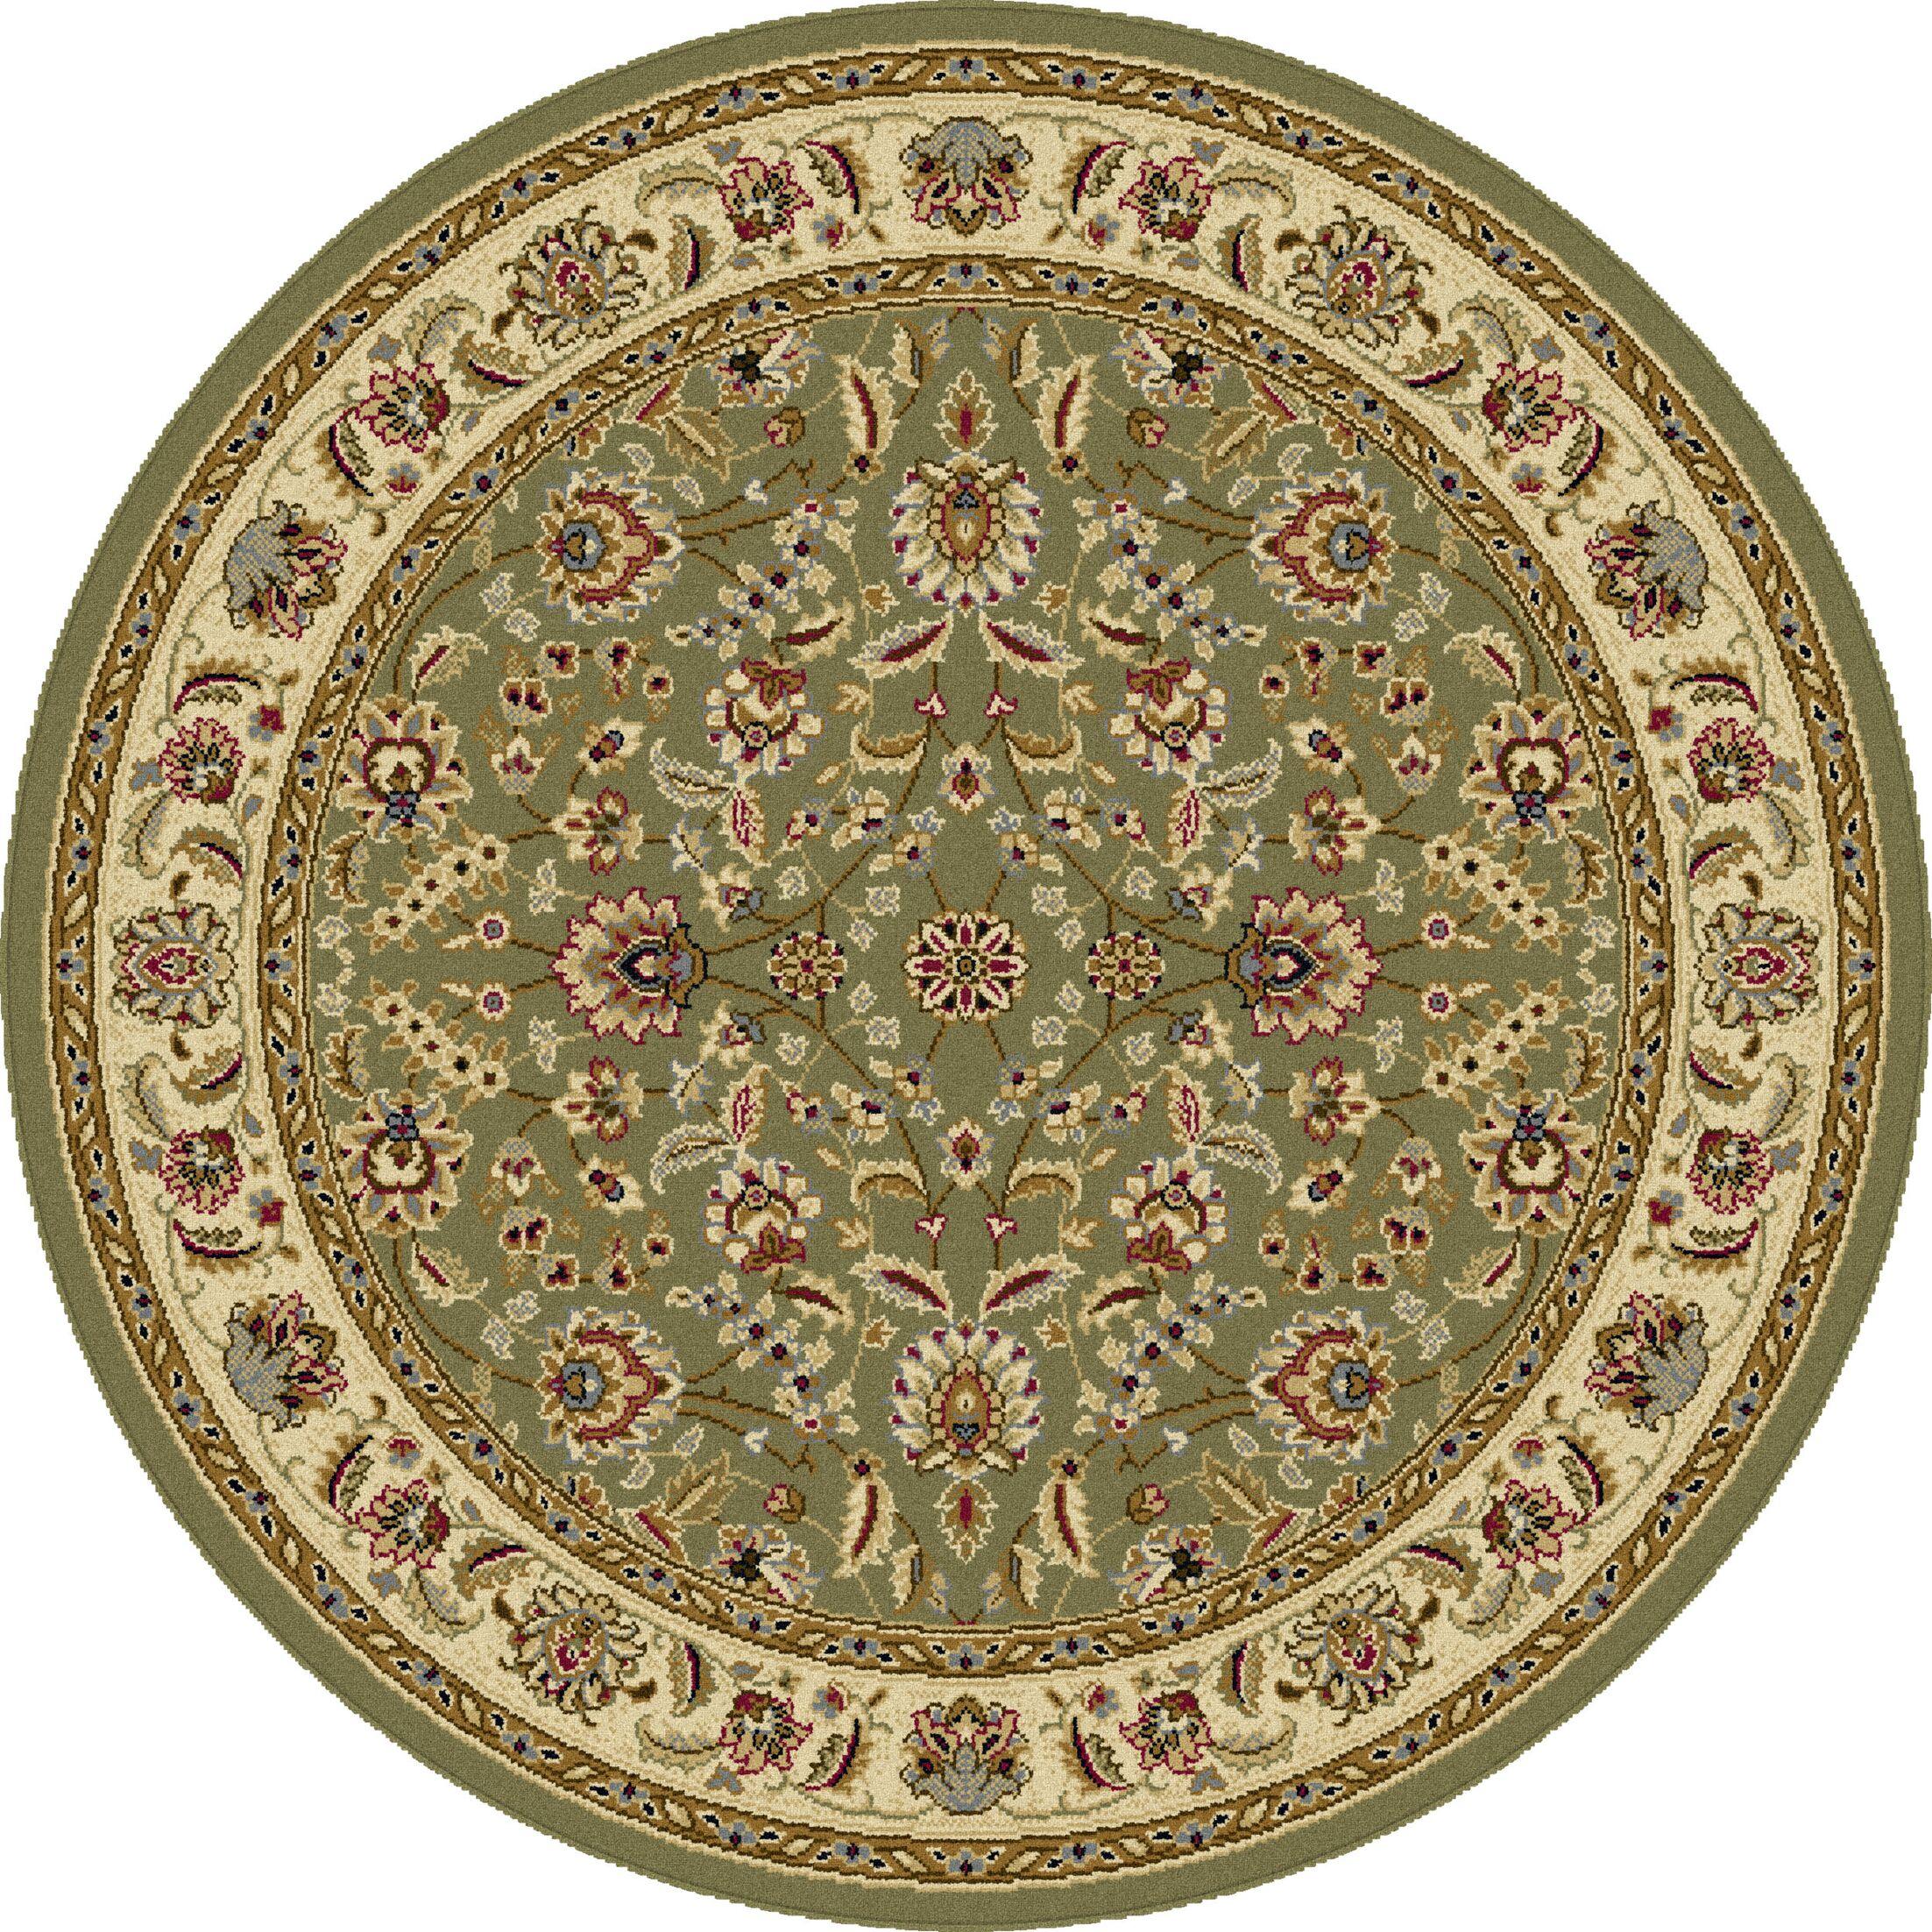 Larios Green Area Rug Rug Size: 7'10'' Round